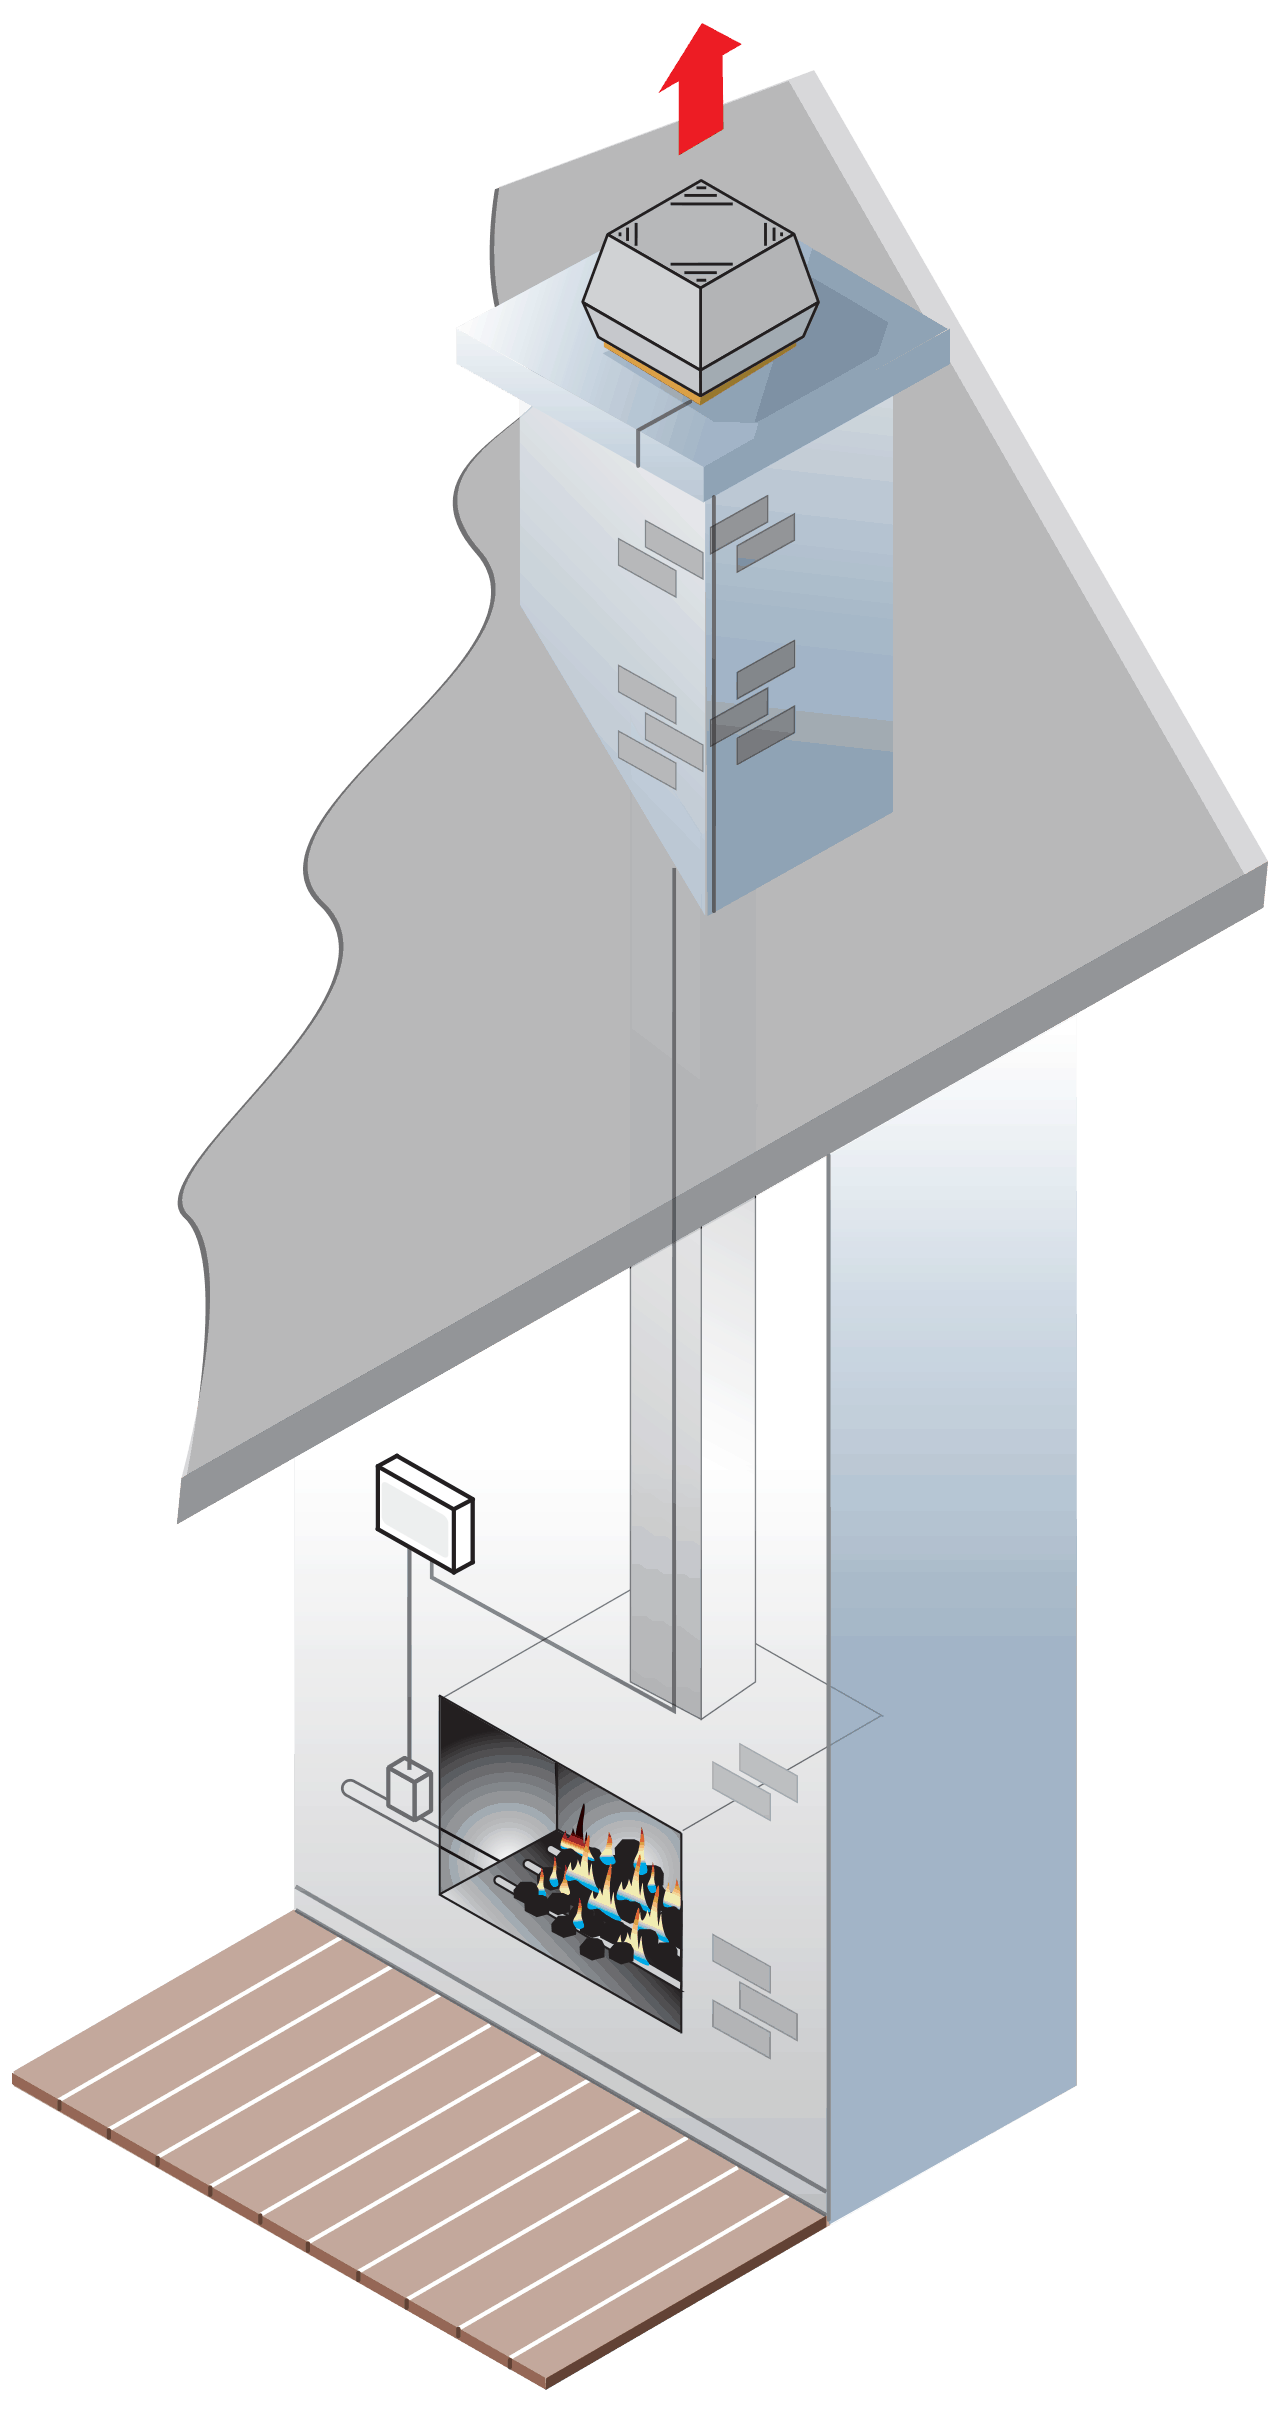 rs gaspejs illustration